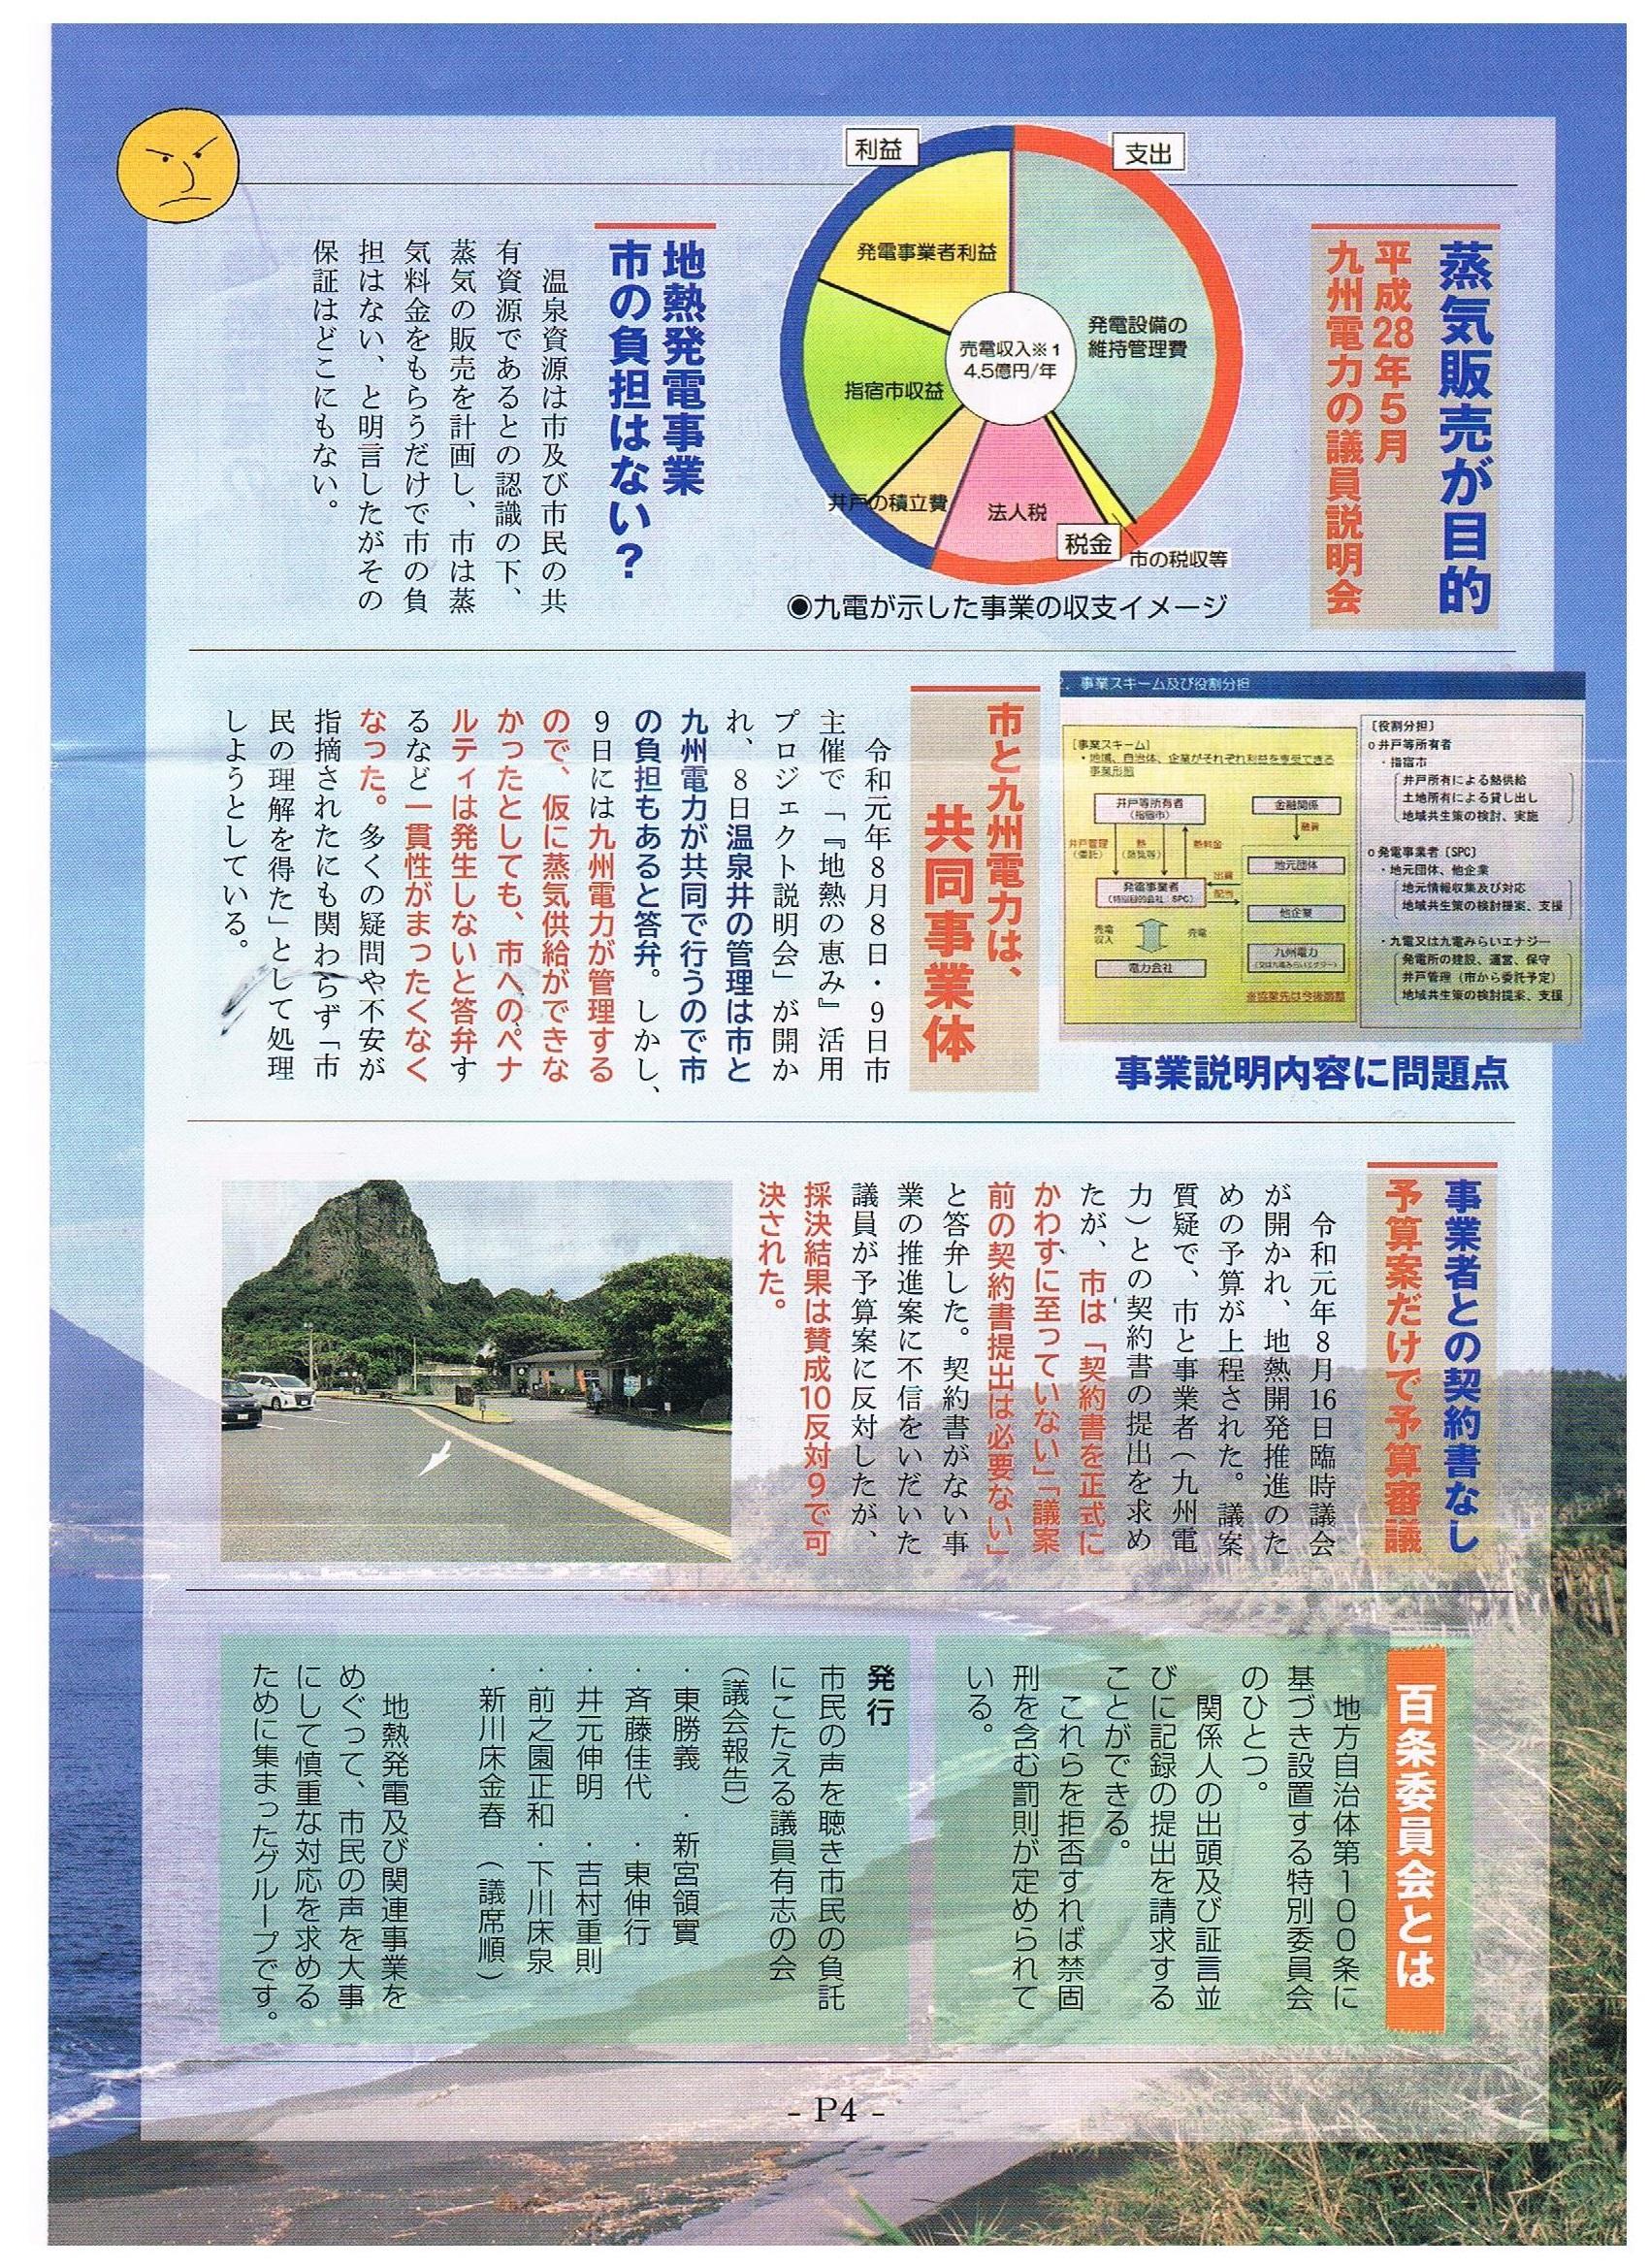 http://hunter-investigate.jp/news/c0e9e57608fad6eac83e71672174534239750340.jpg